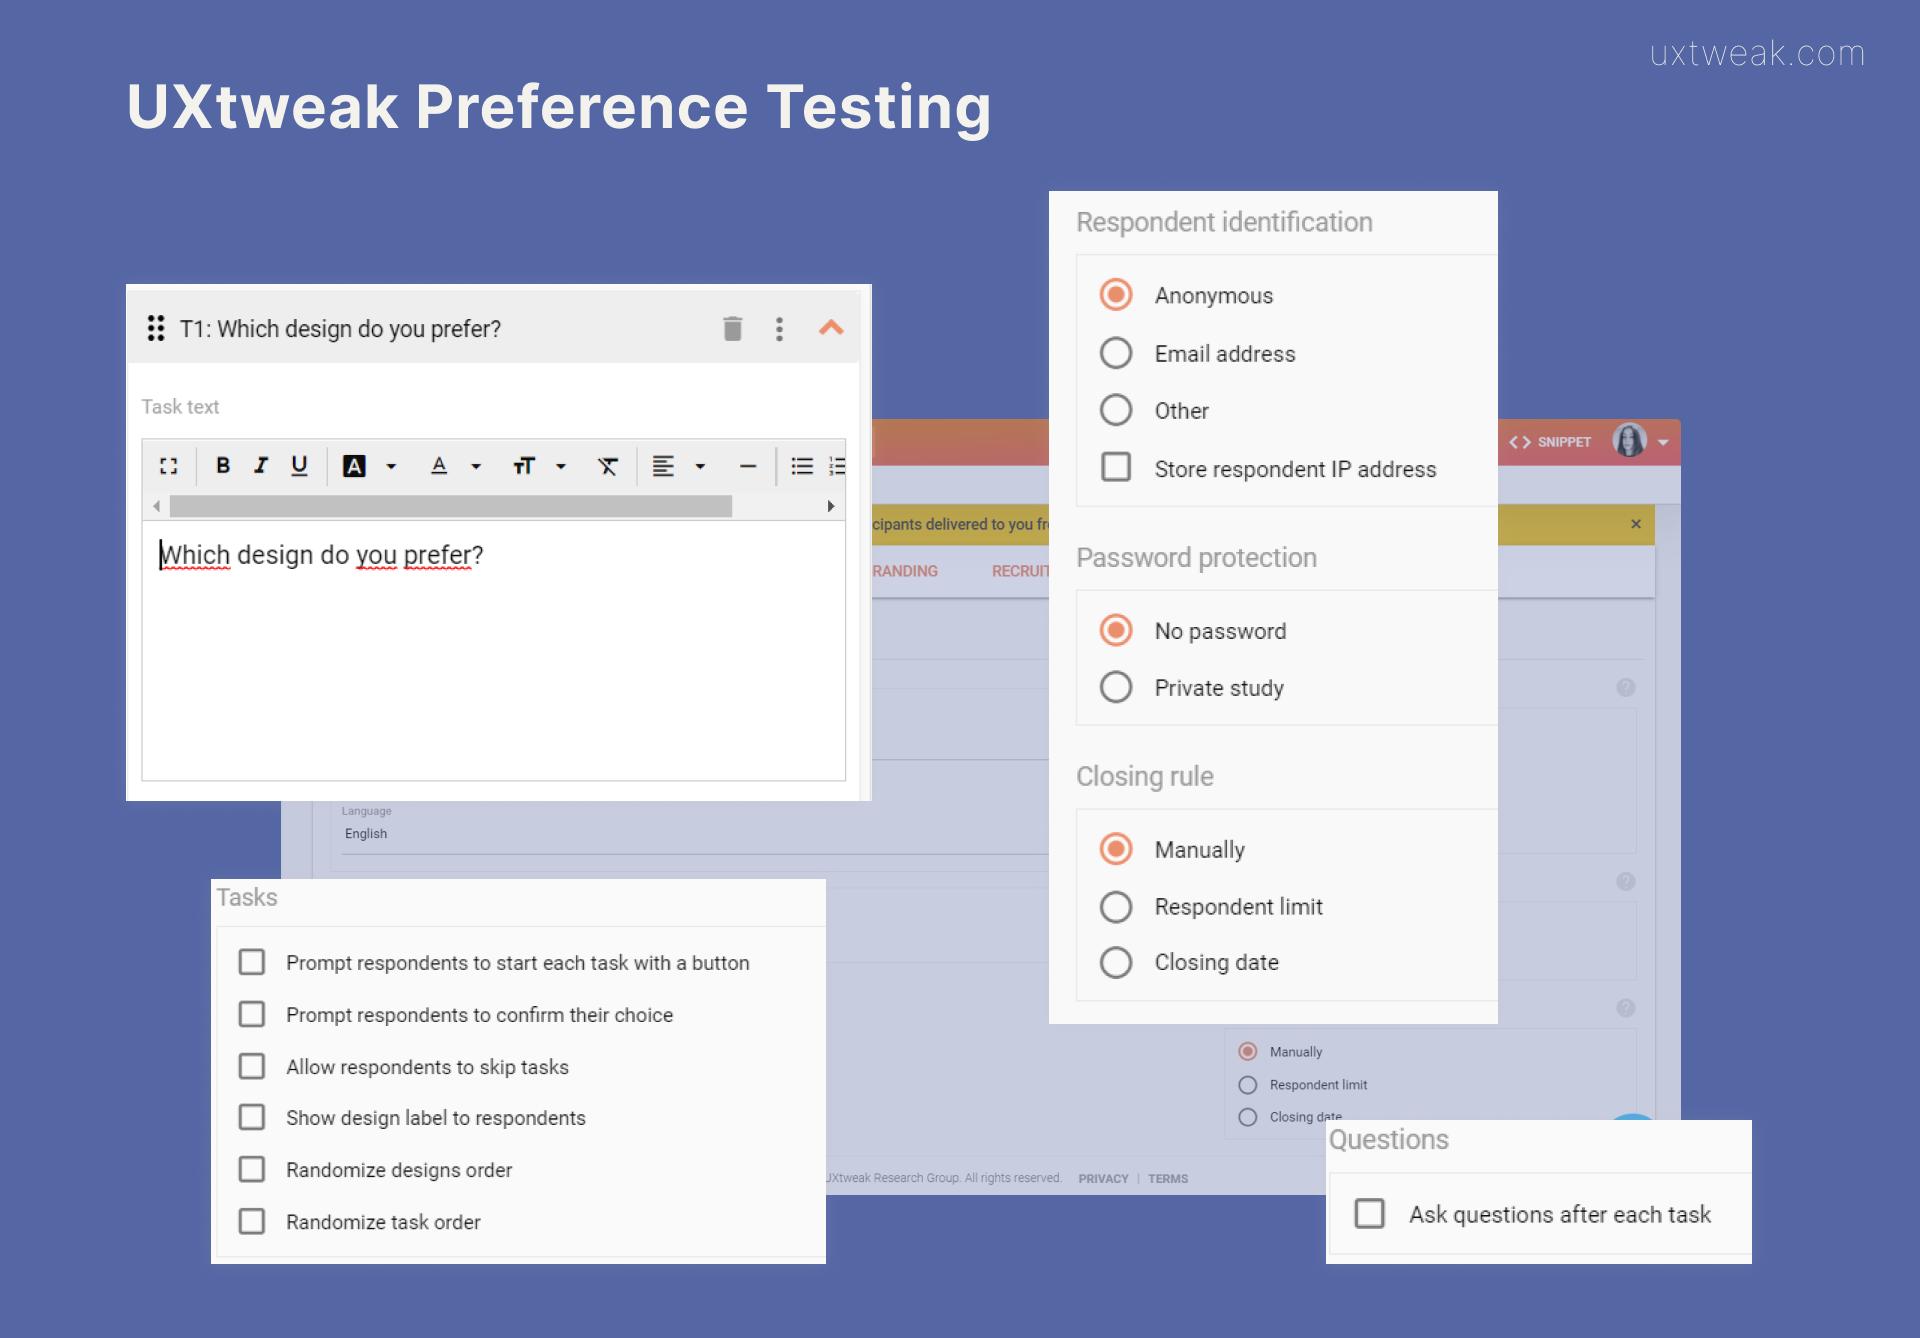 uxtweak preference testing tool